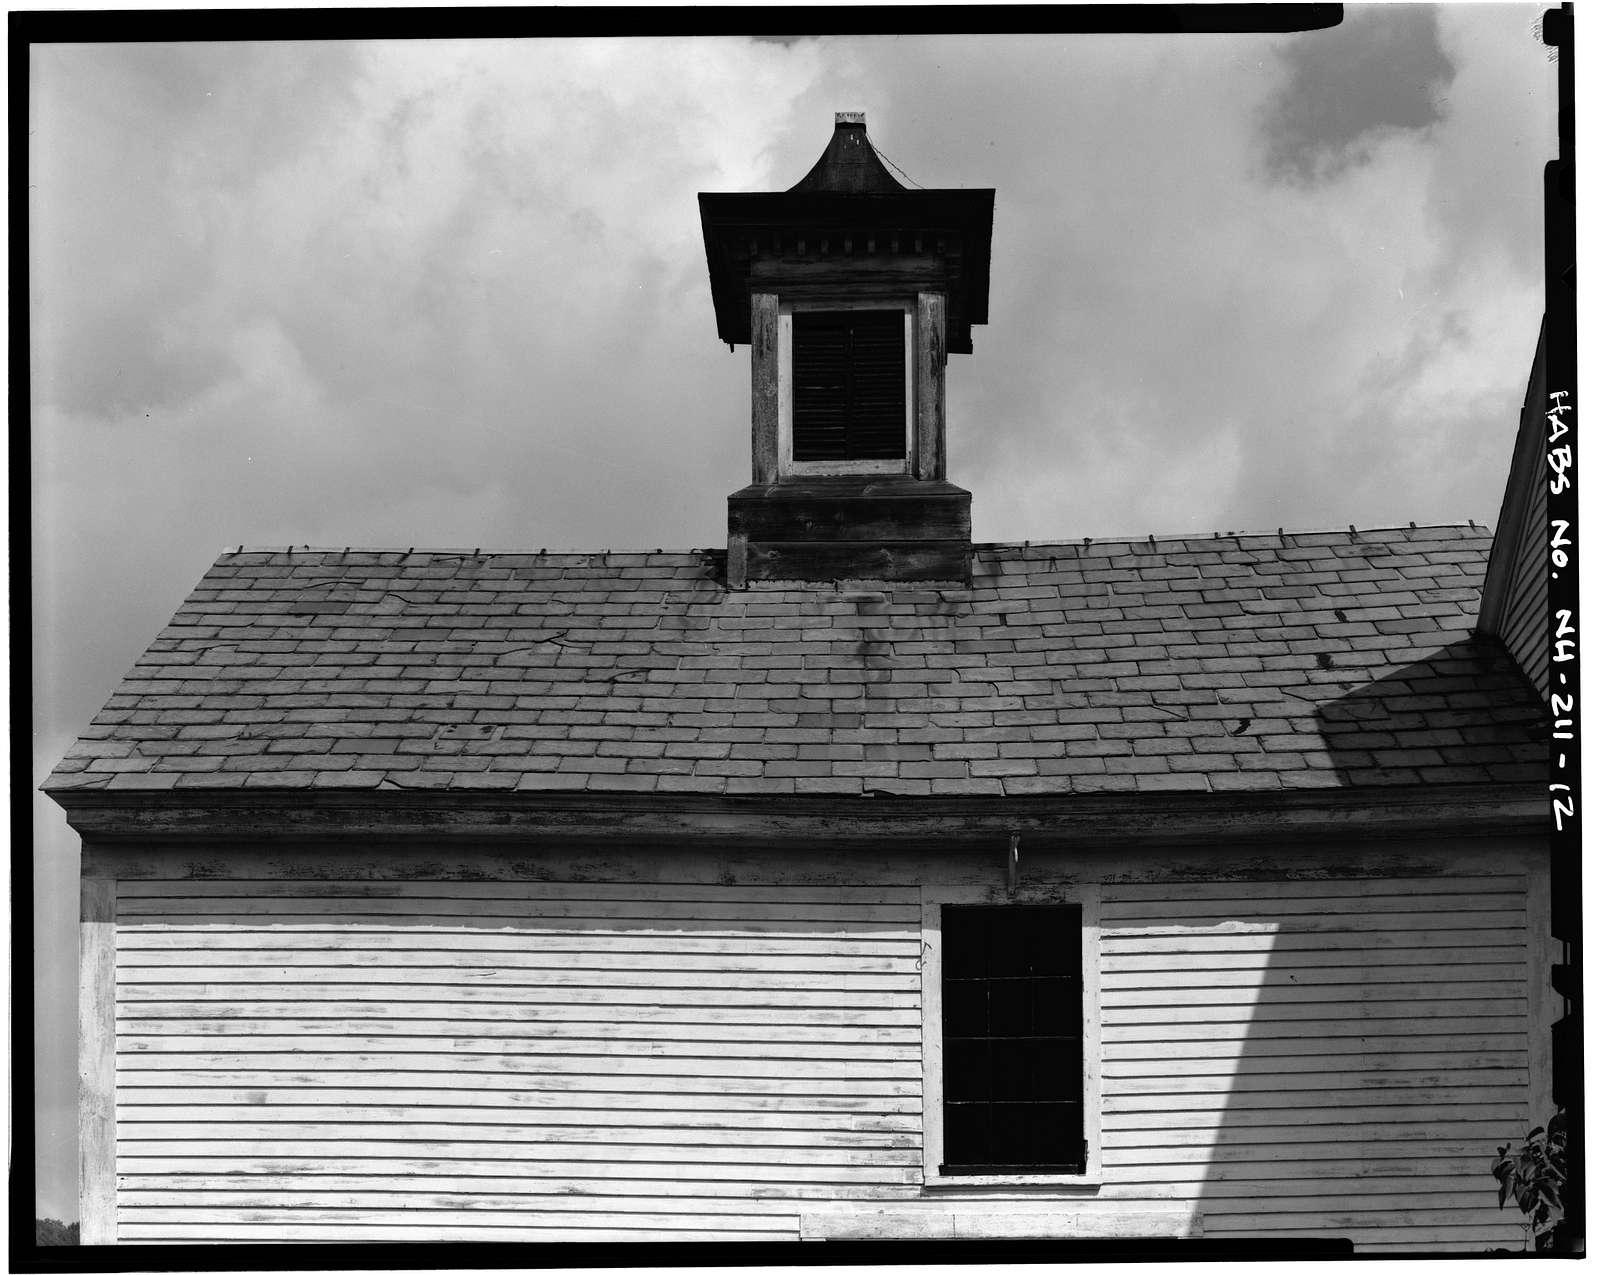 Solon W. Stone House, 15 Frost Street, Marlborough, Cheshire County, NH